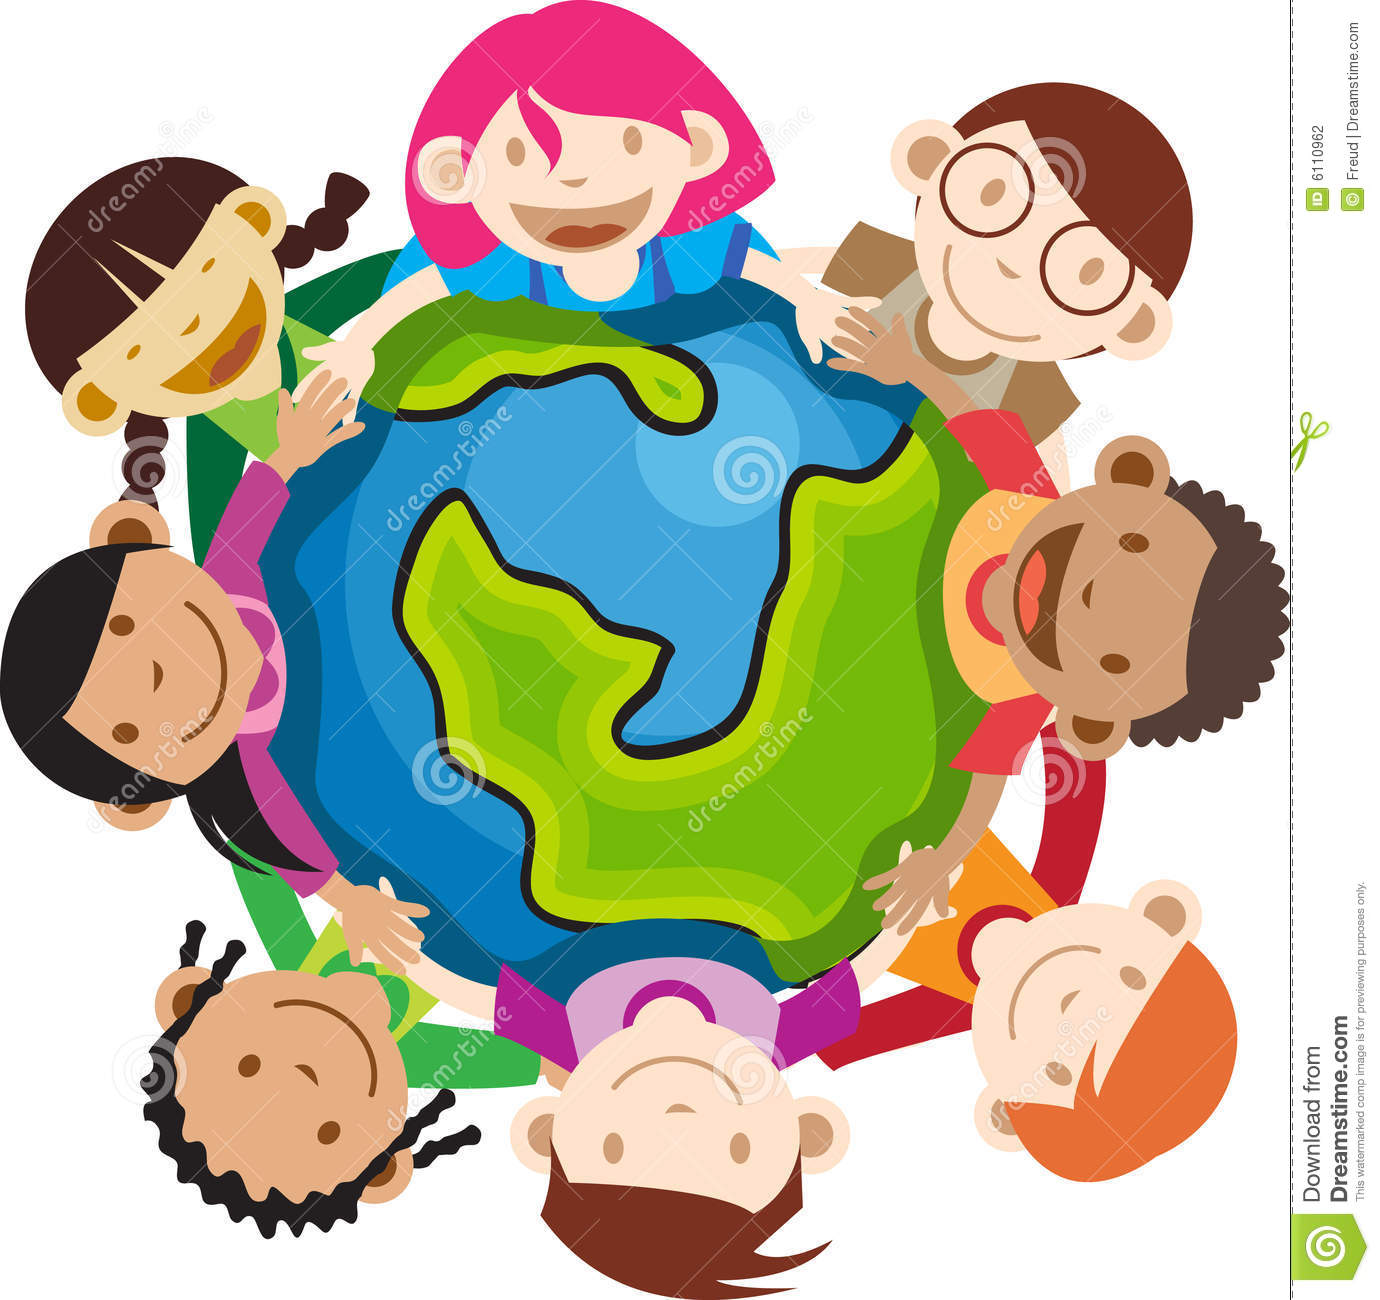 1380x1300 Free Clipart Children Around Globe No Watermark